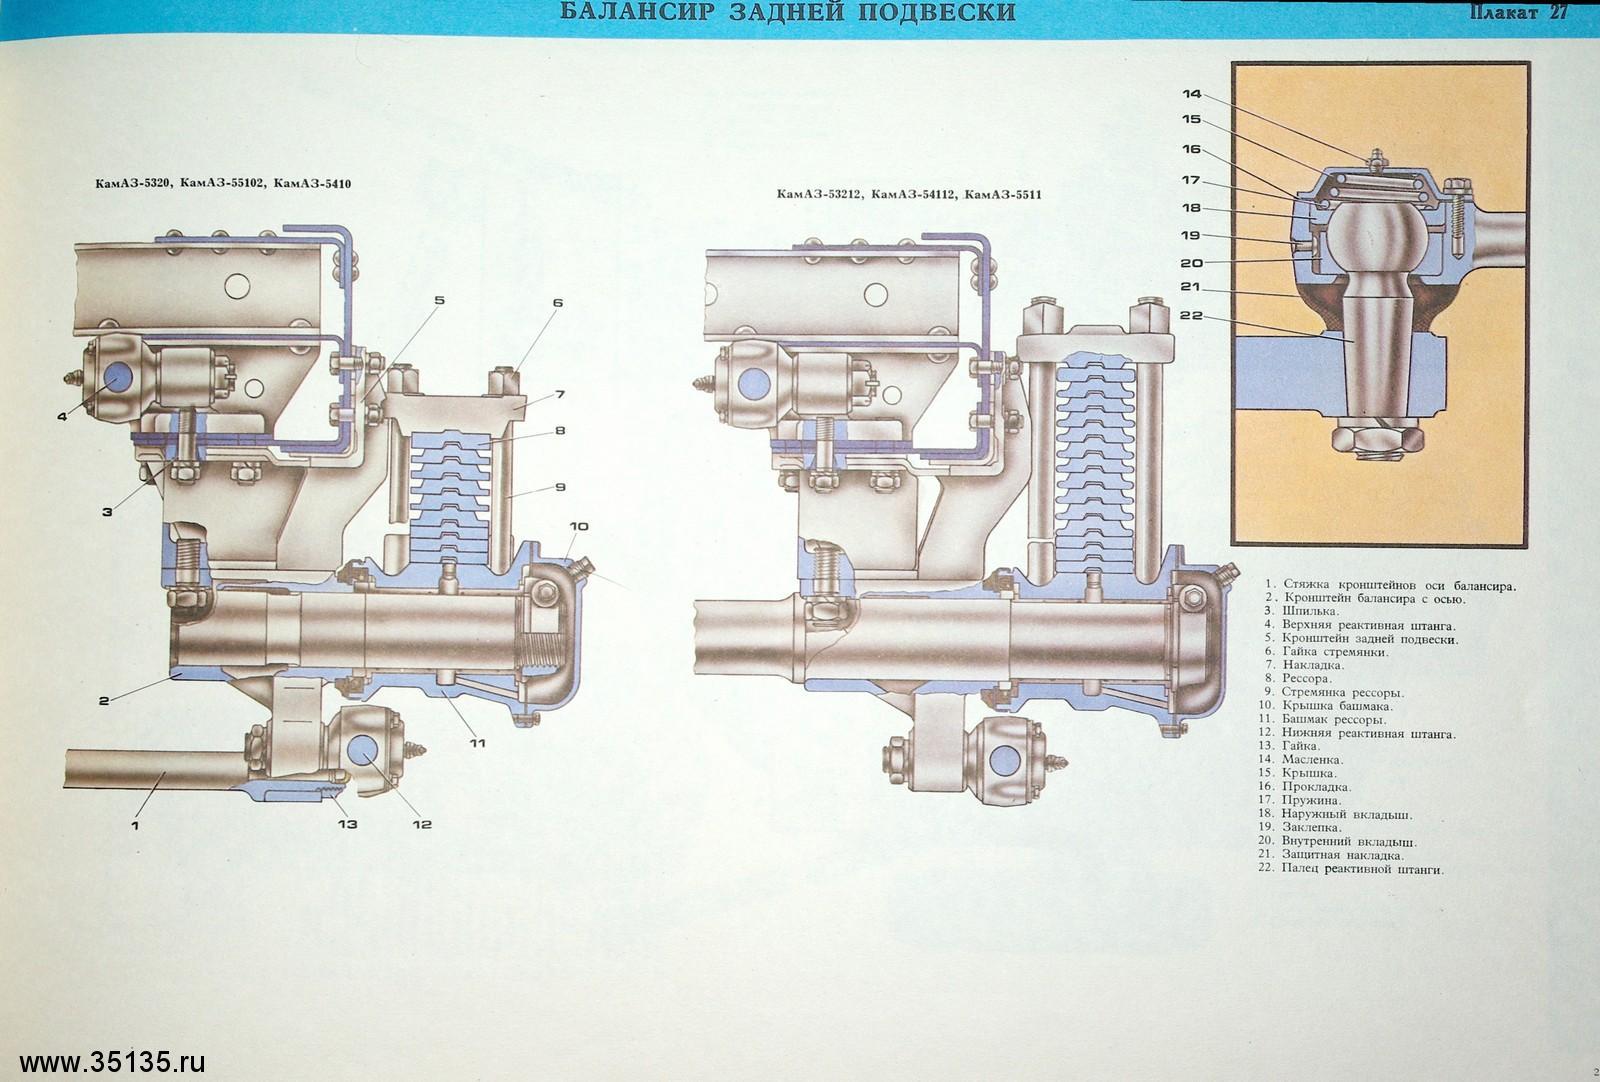 Схема оси балансира камаз   Схемы сети: http://jokestaff.myftp.org/2013/08/12/shema-osi-balansira-kamaz/